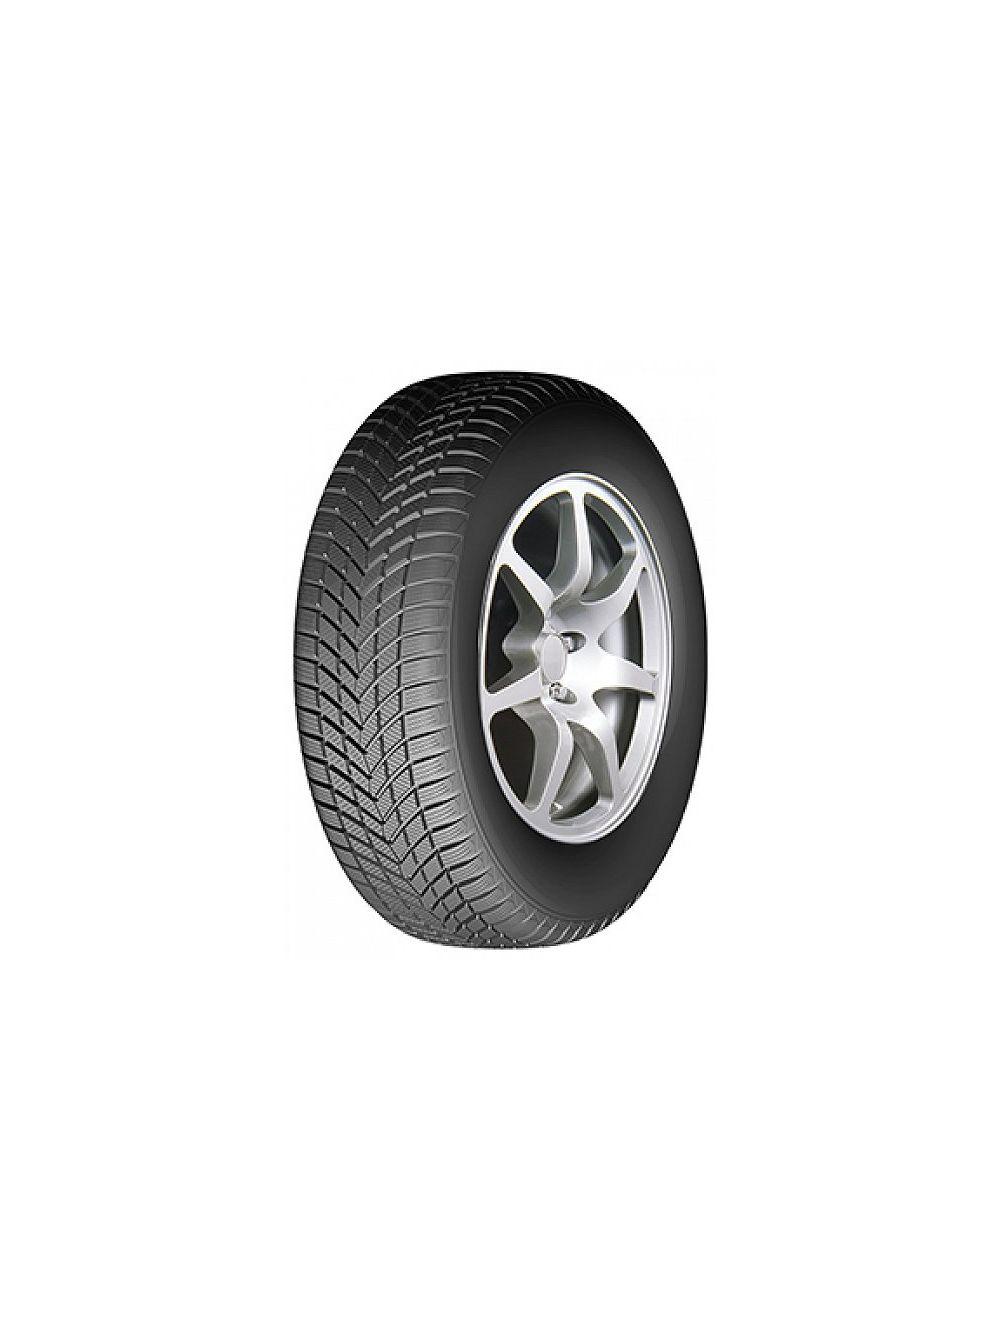 Infinity 185/55R15 H EcoZen XL Téli gumi